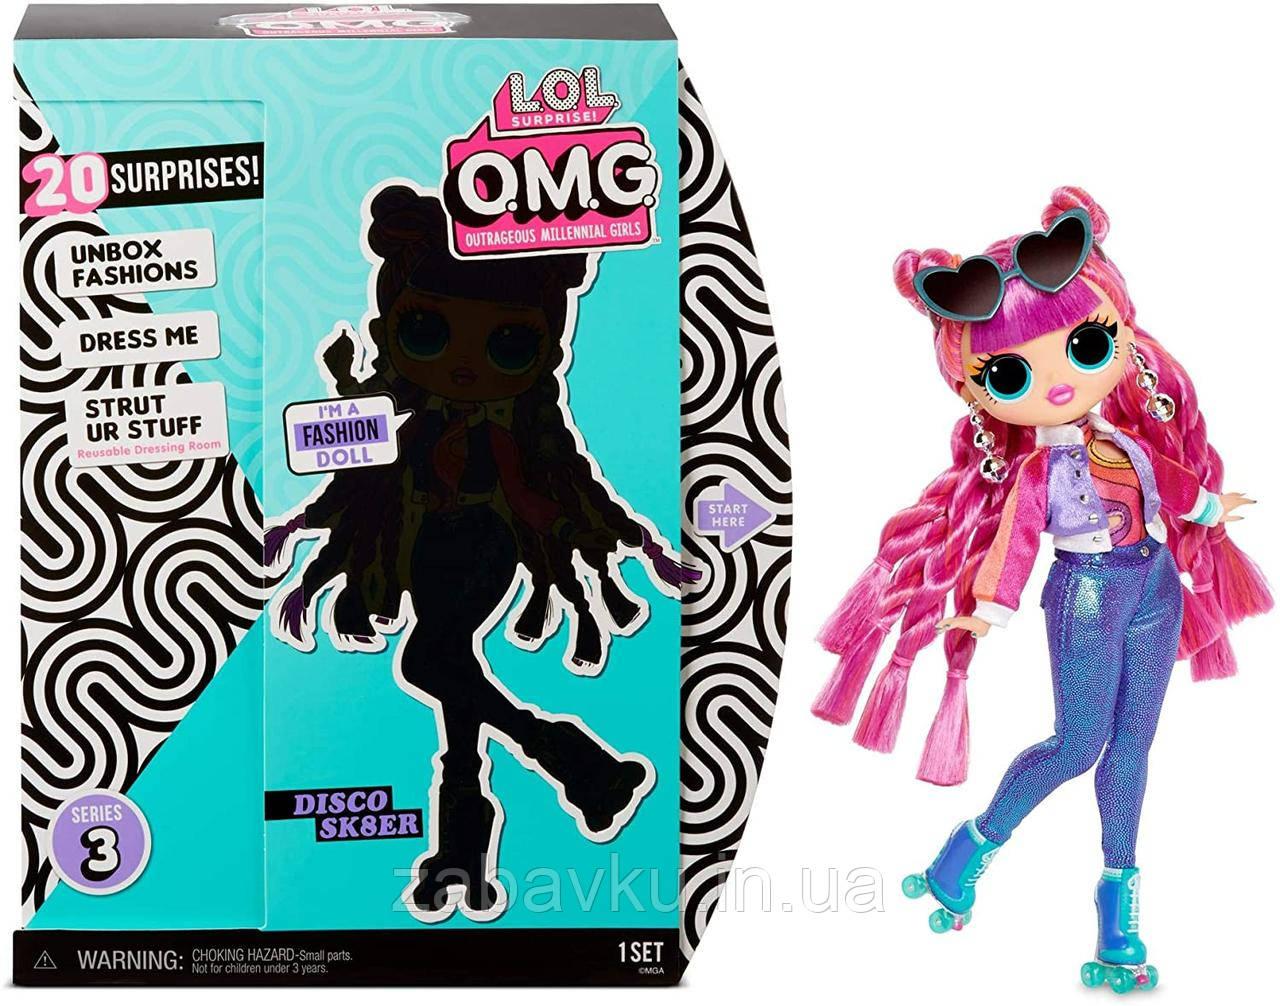 LOL Surprise OMG Series 3 - Roller Chick Fashion Doll  Кукла ЛОЛ ОМГ Диско Скейтер